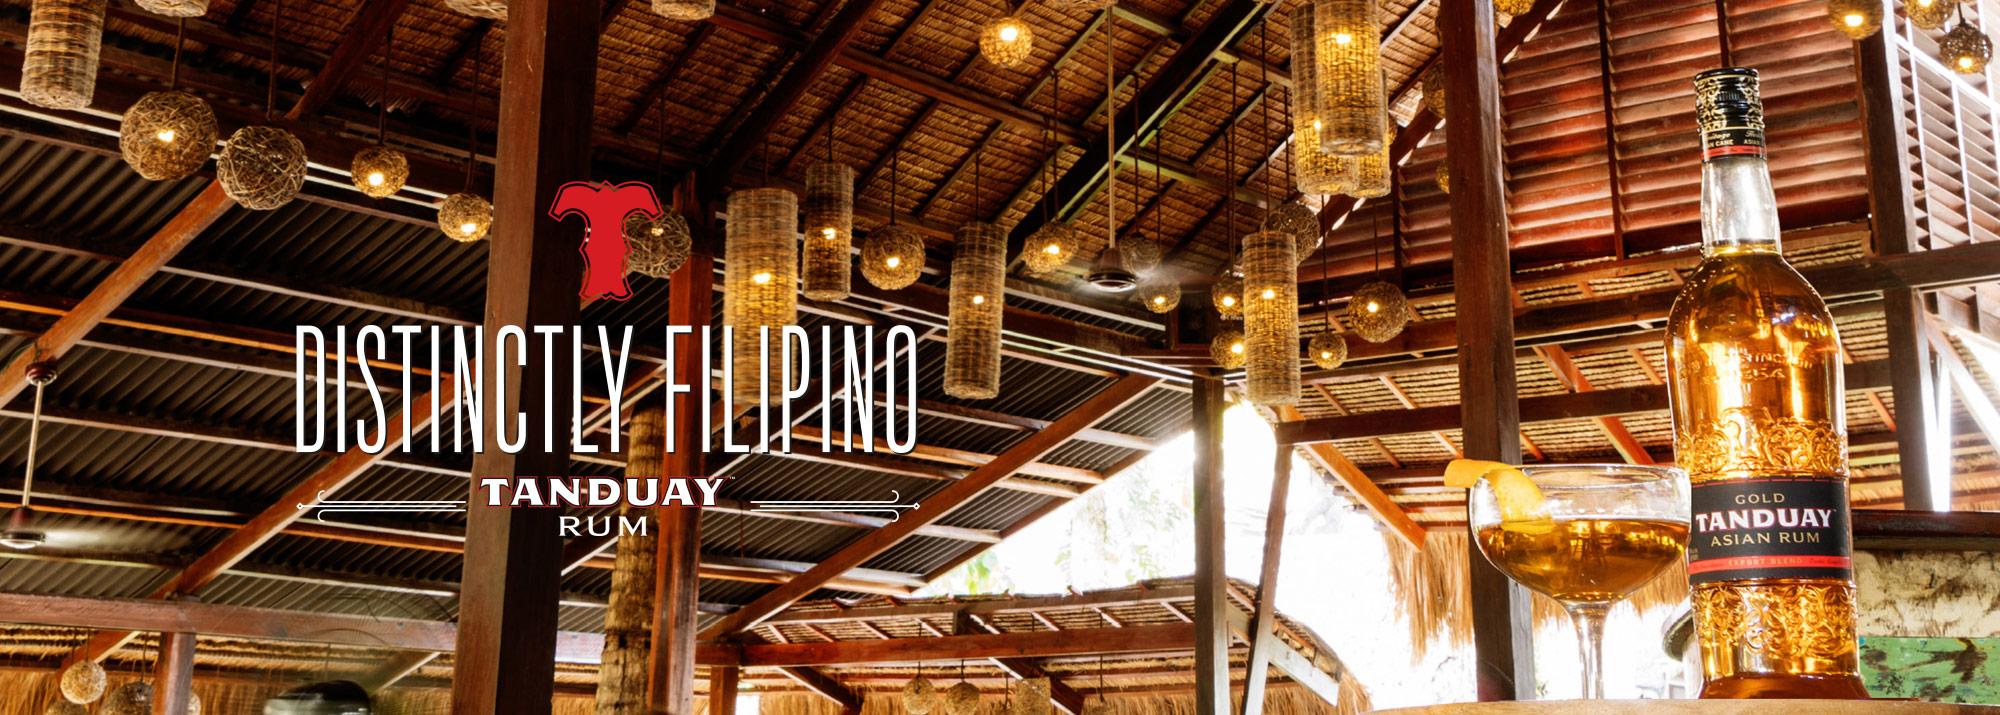 tanduay-banner-one-Jan2019.jpg